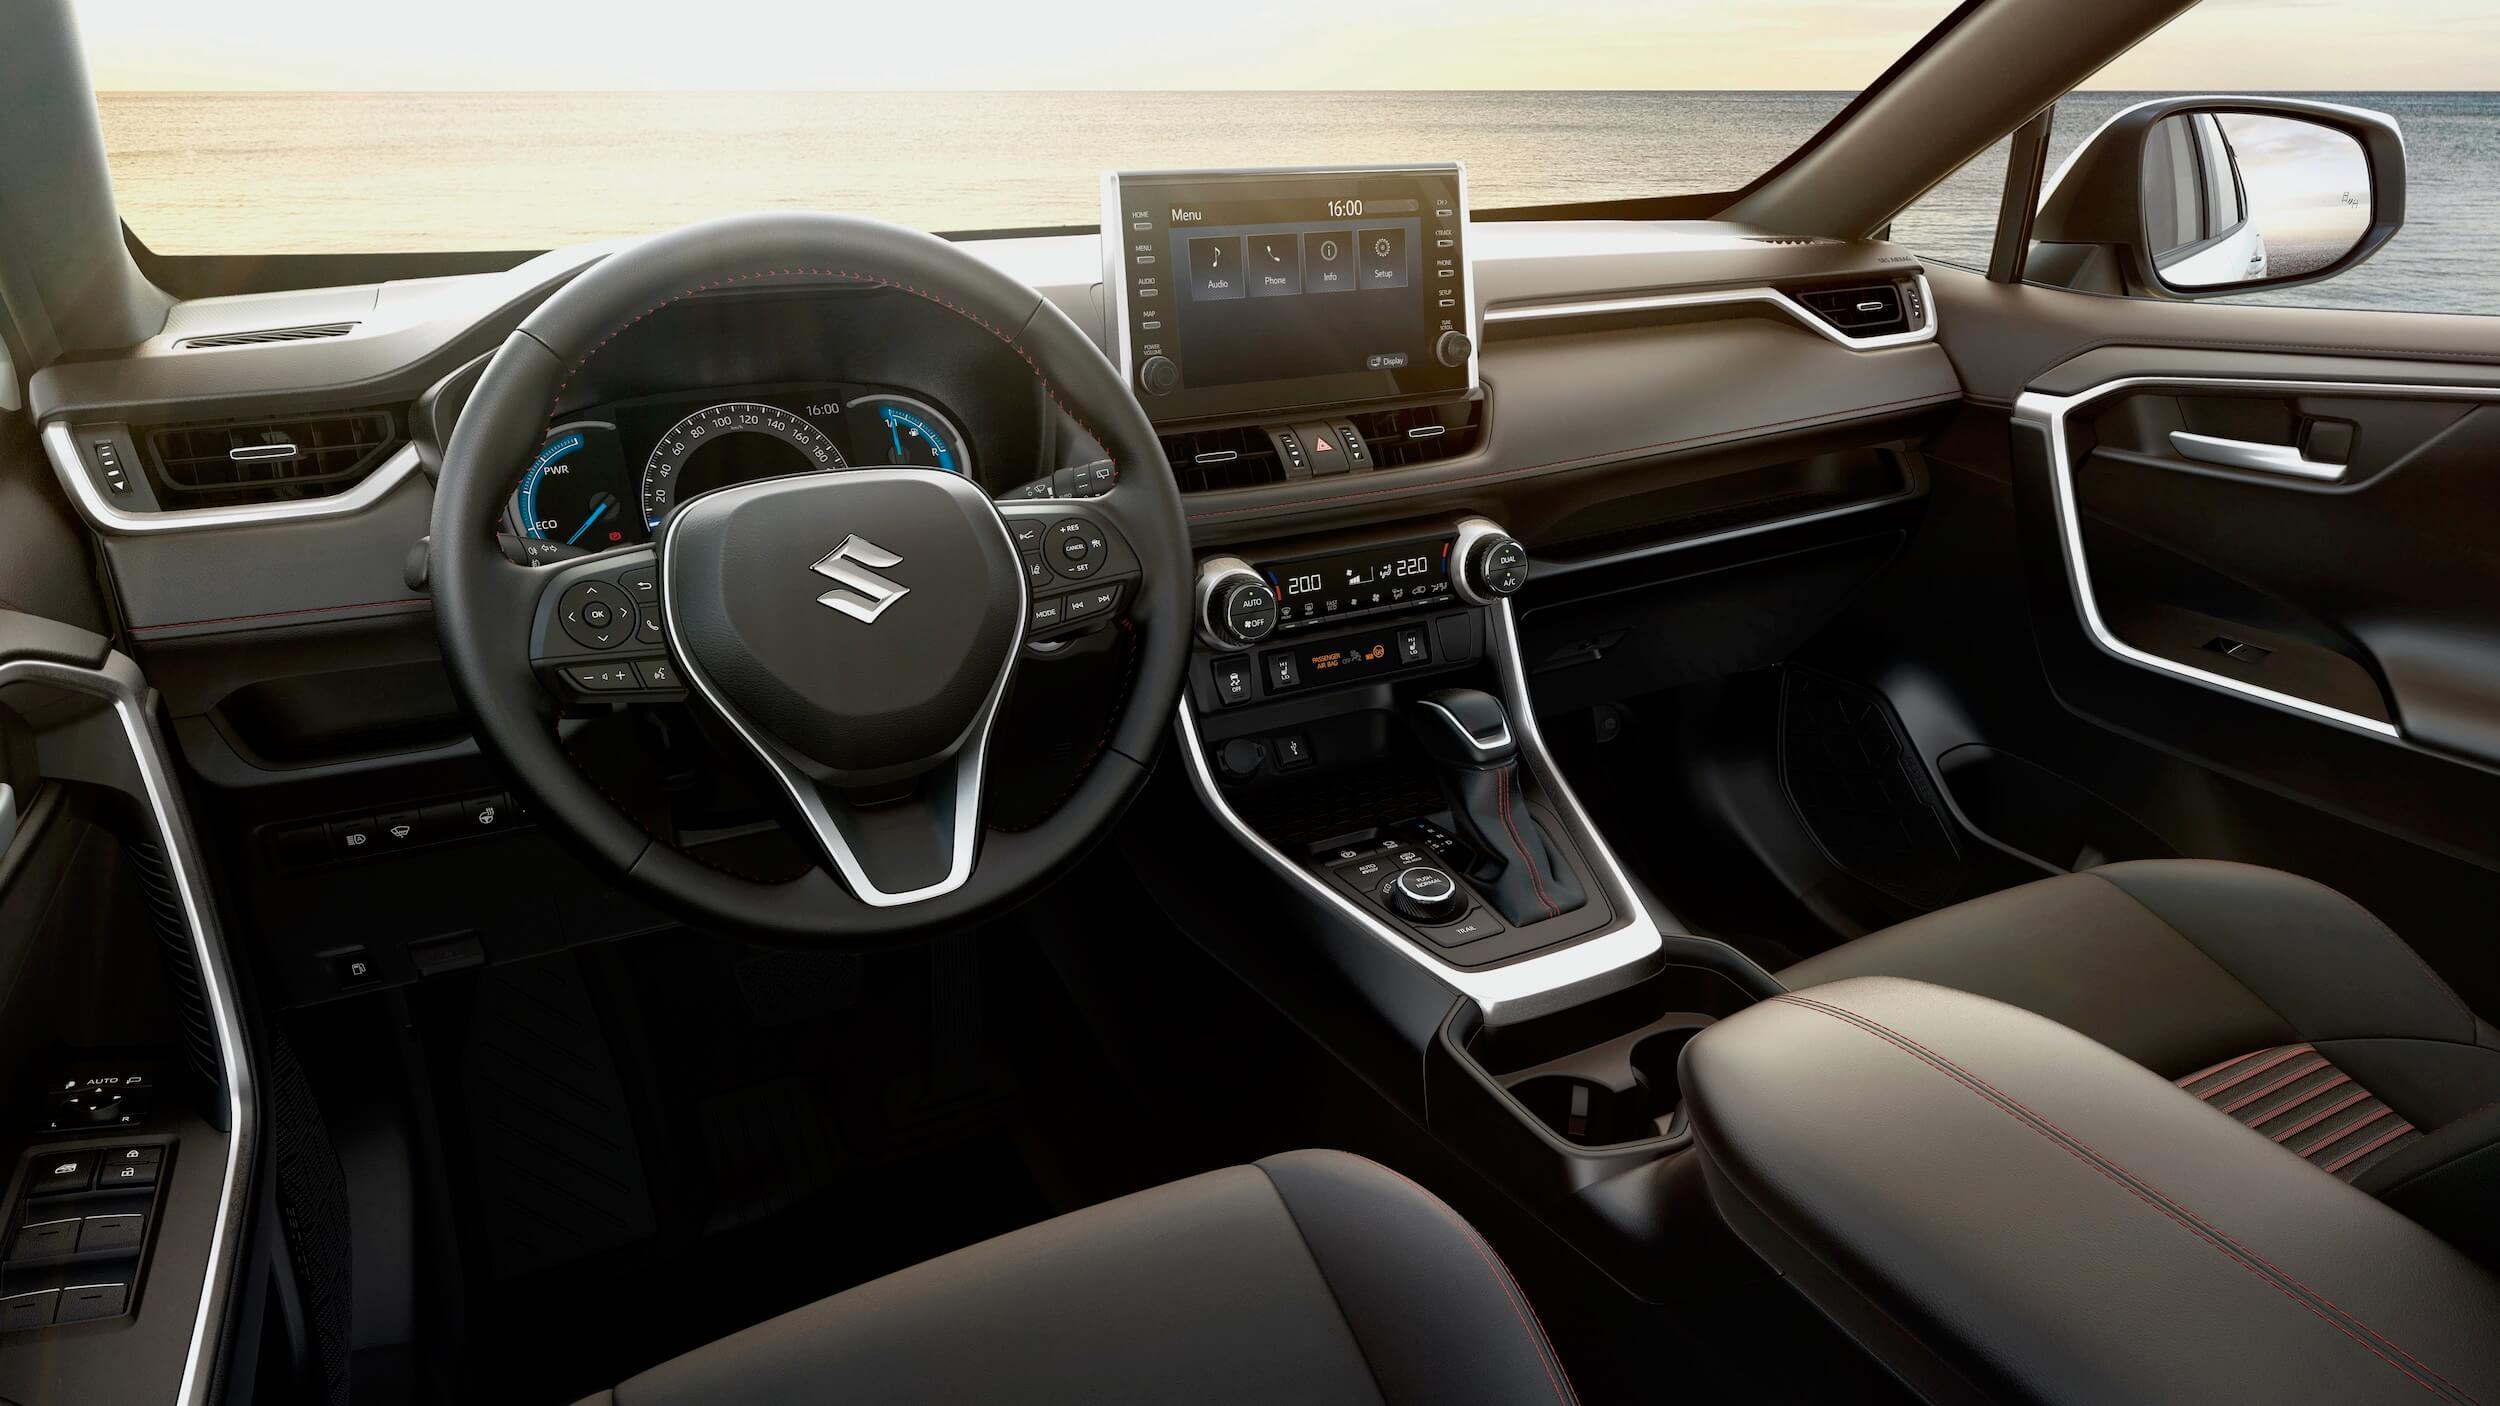 novo SUV Suzuki interior Rav4